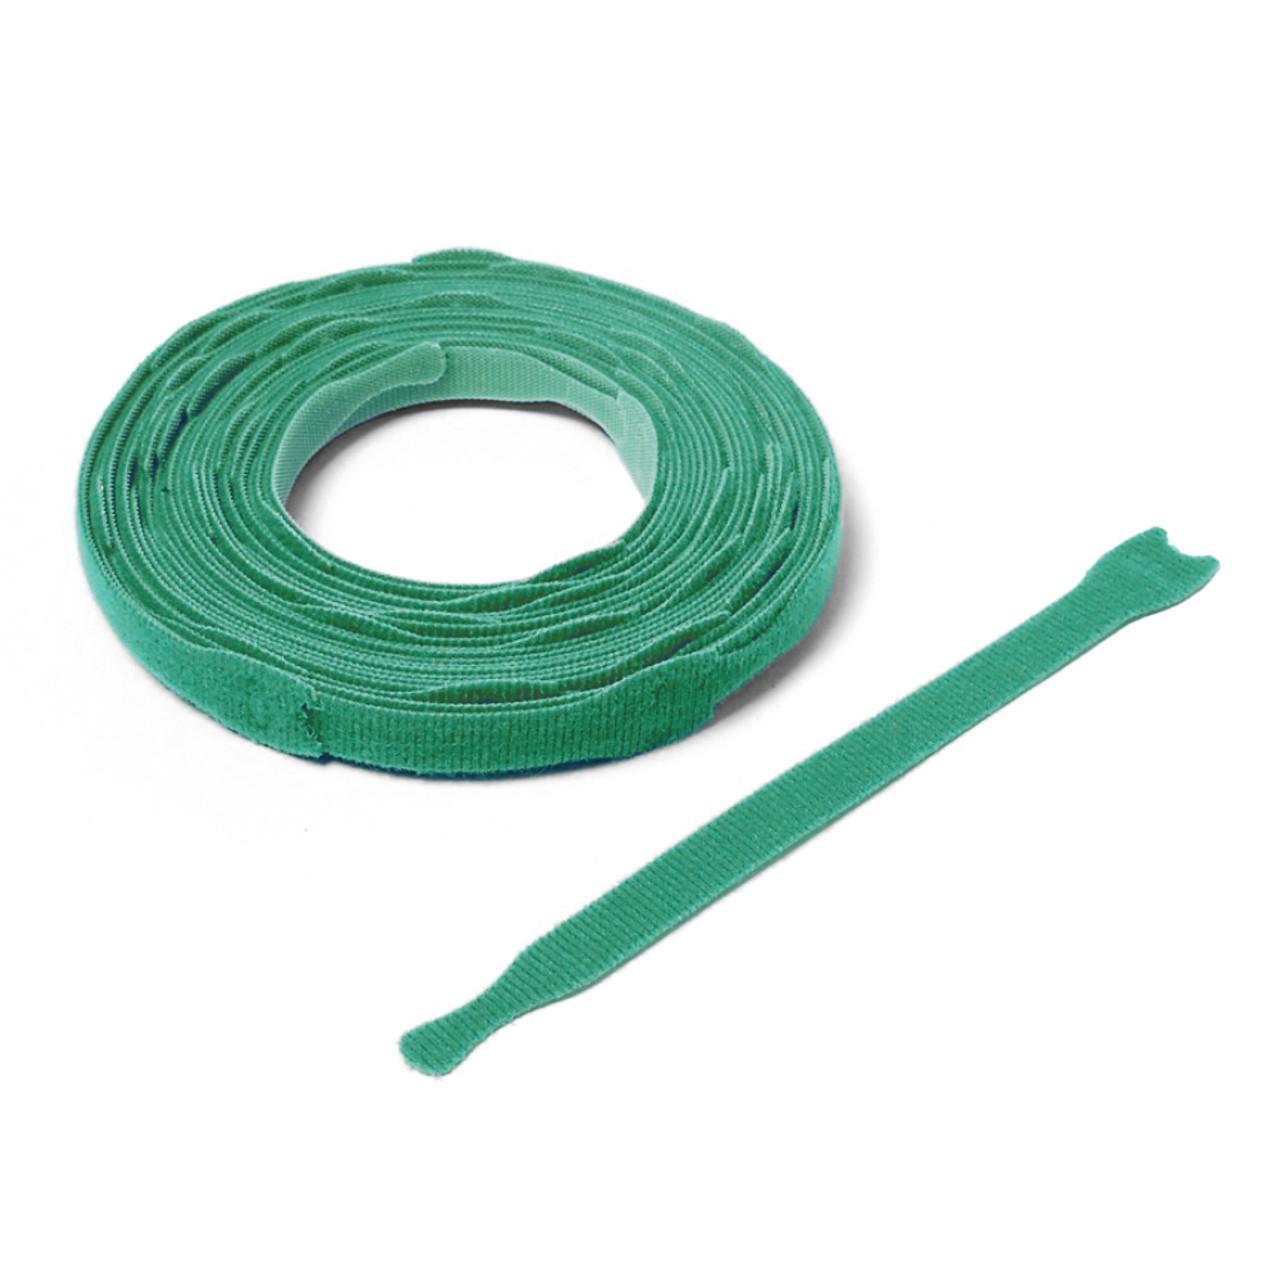 VELCRO ® Brand ONE-WRAP ® Die-Cut Straps - Green